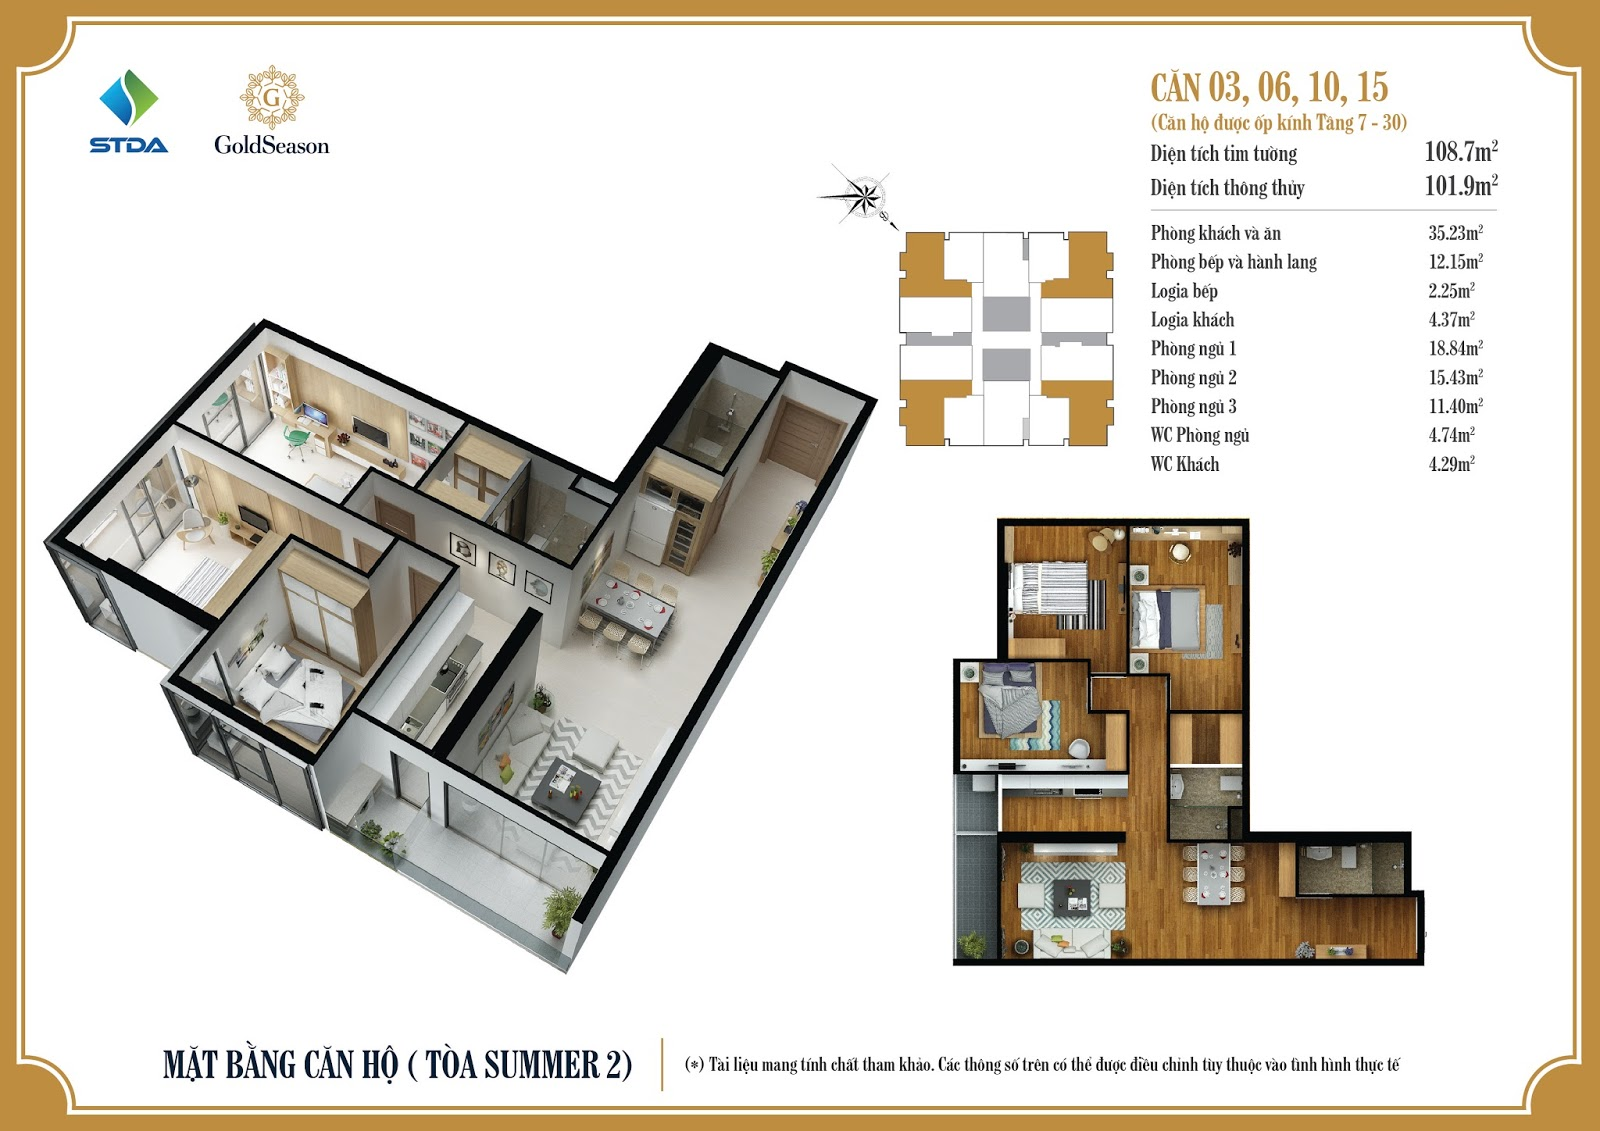 Mặt bằng căn hộ ốp kính 03, 06, 10, 15 tầng 7-30 - GoldSeason